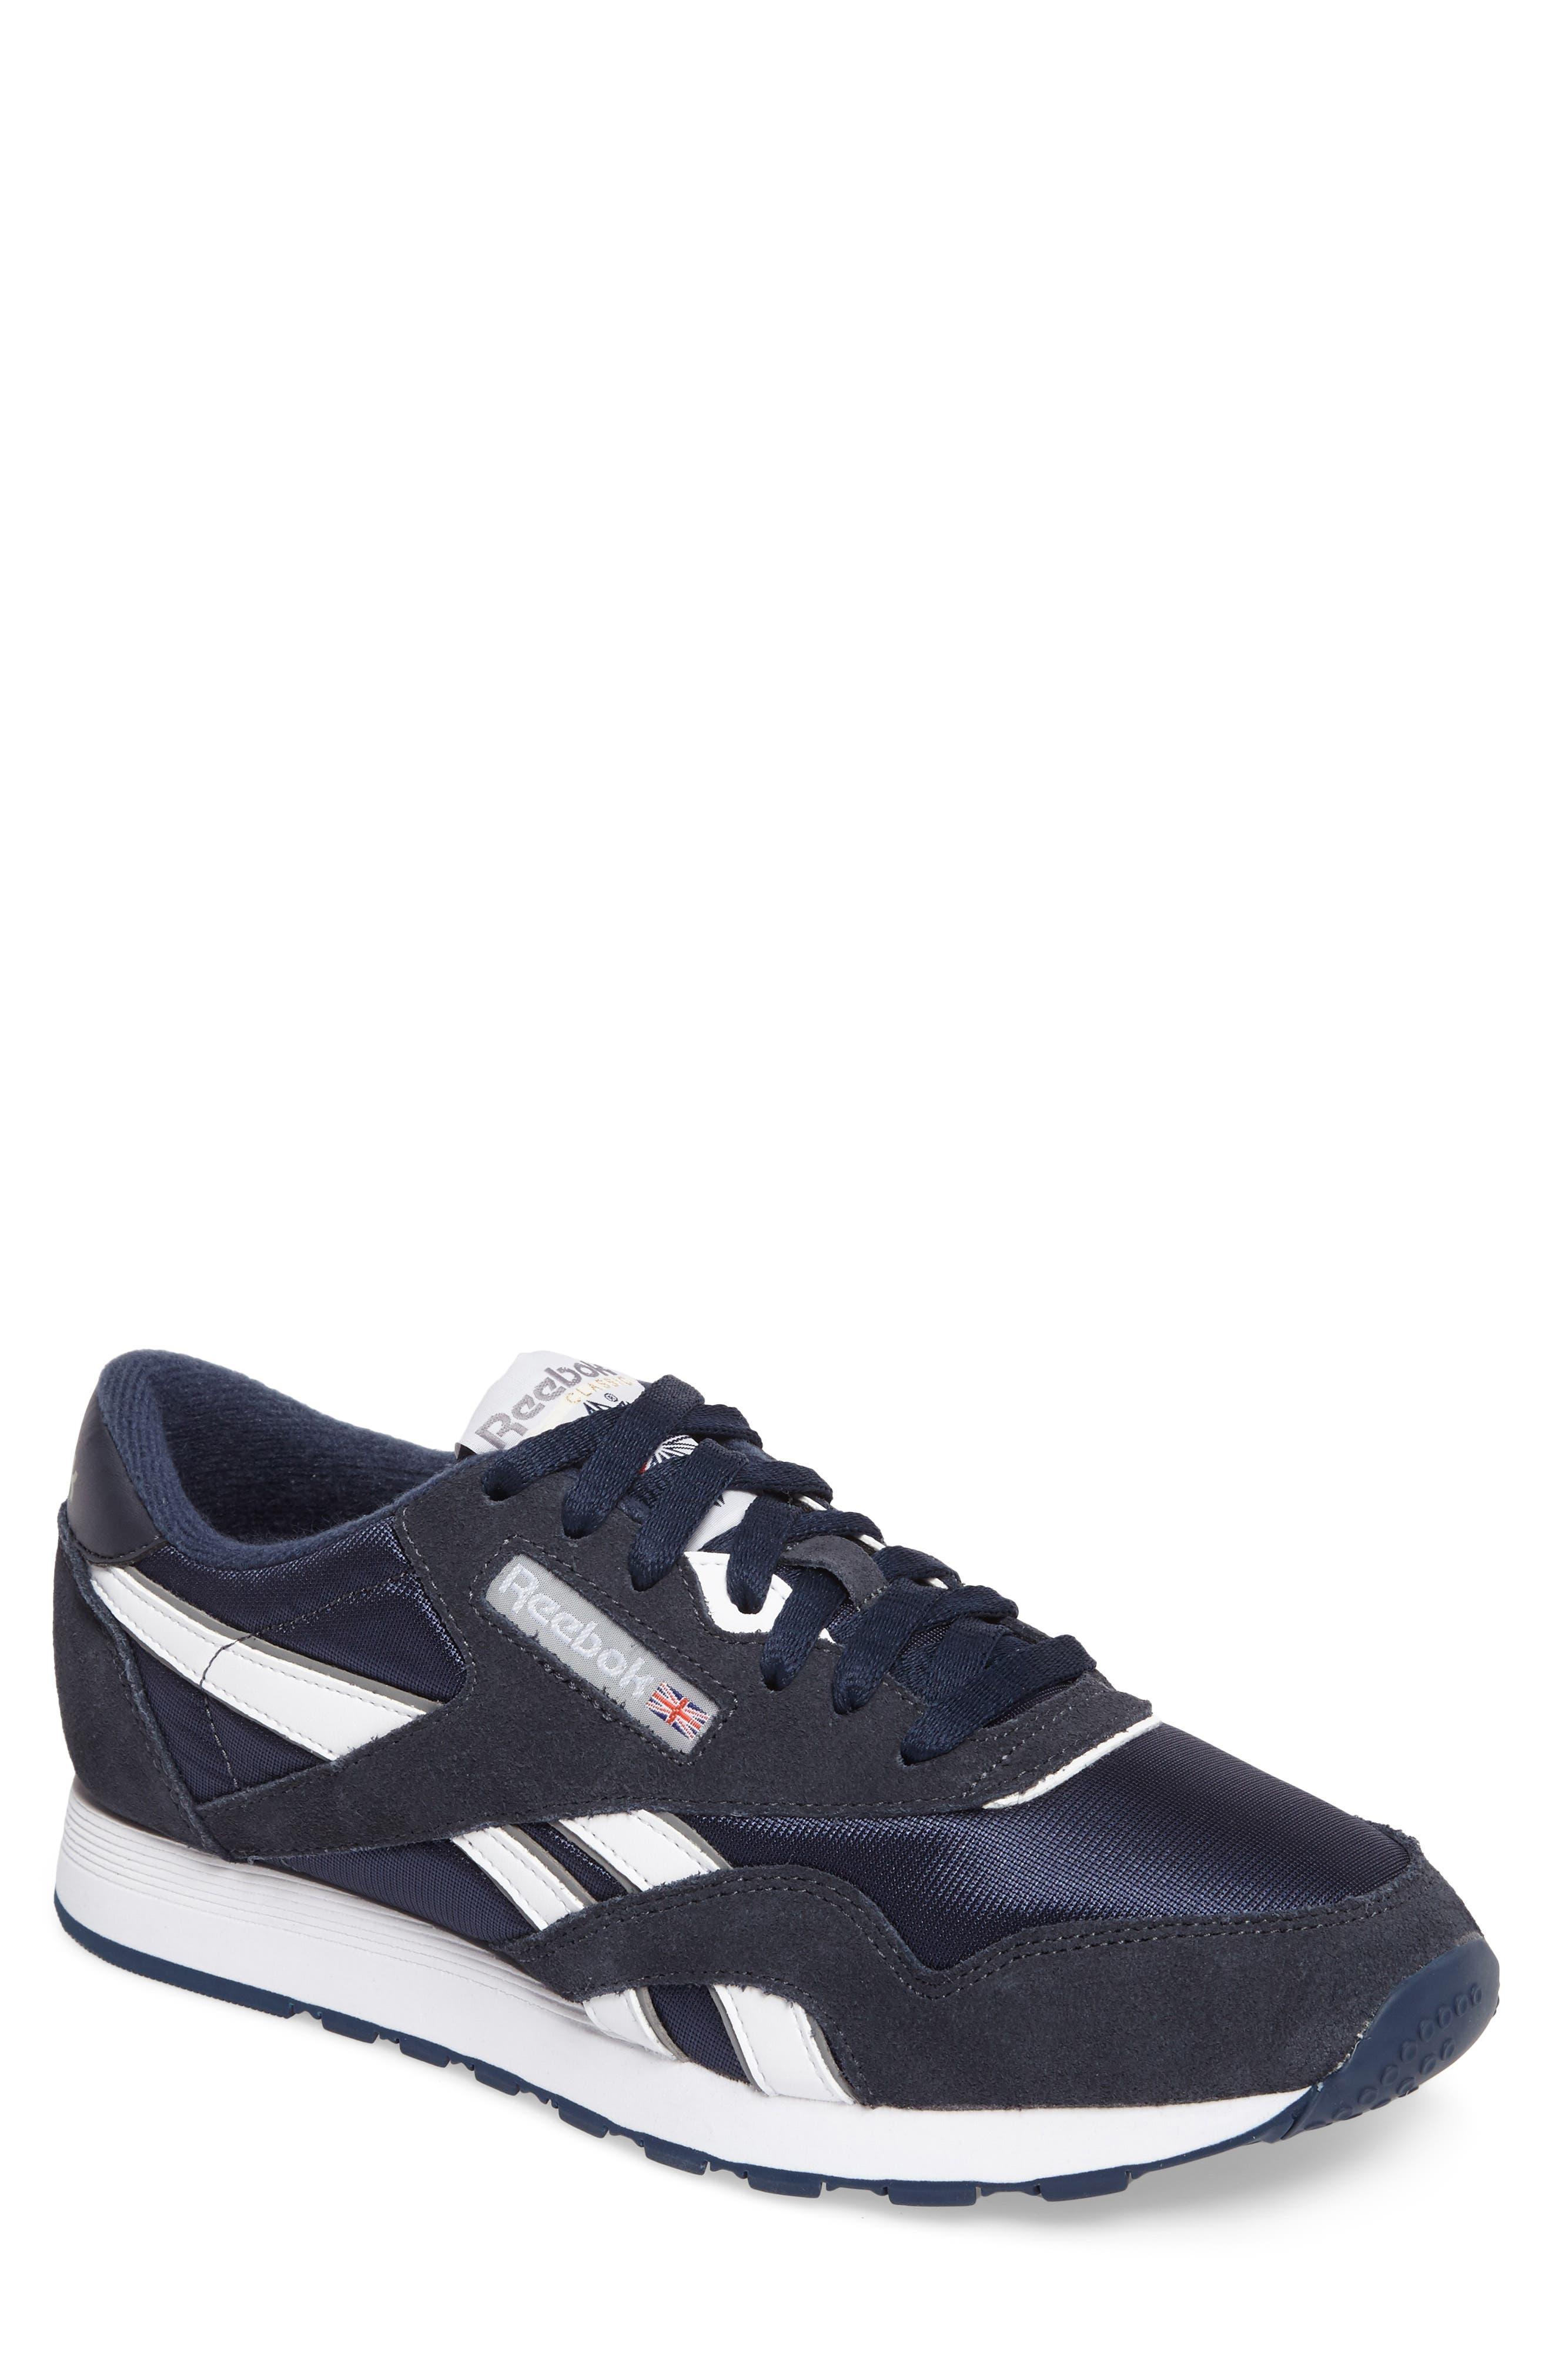 Reebok Classic Nylon Sneaker (Men)